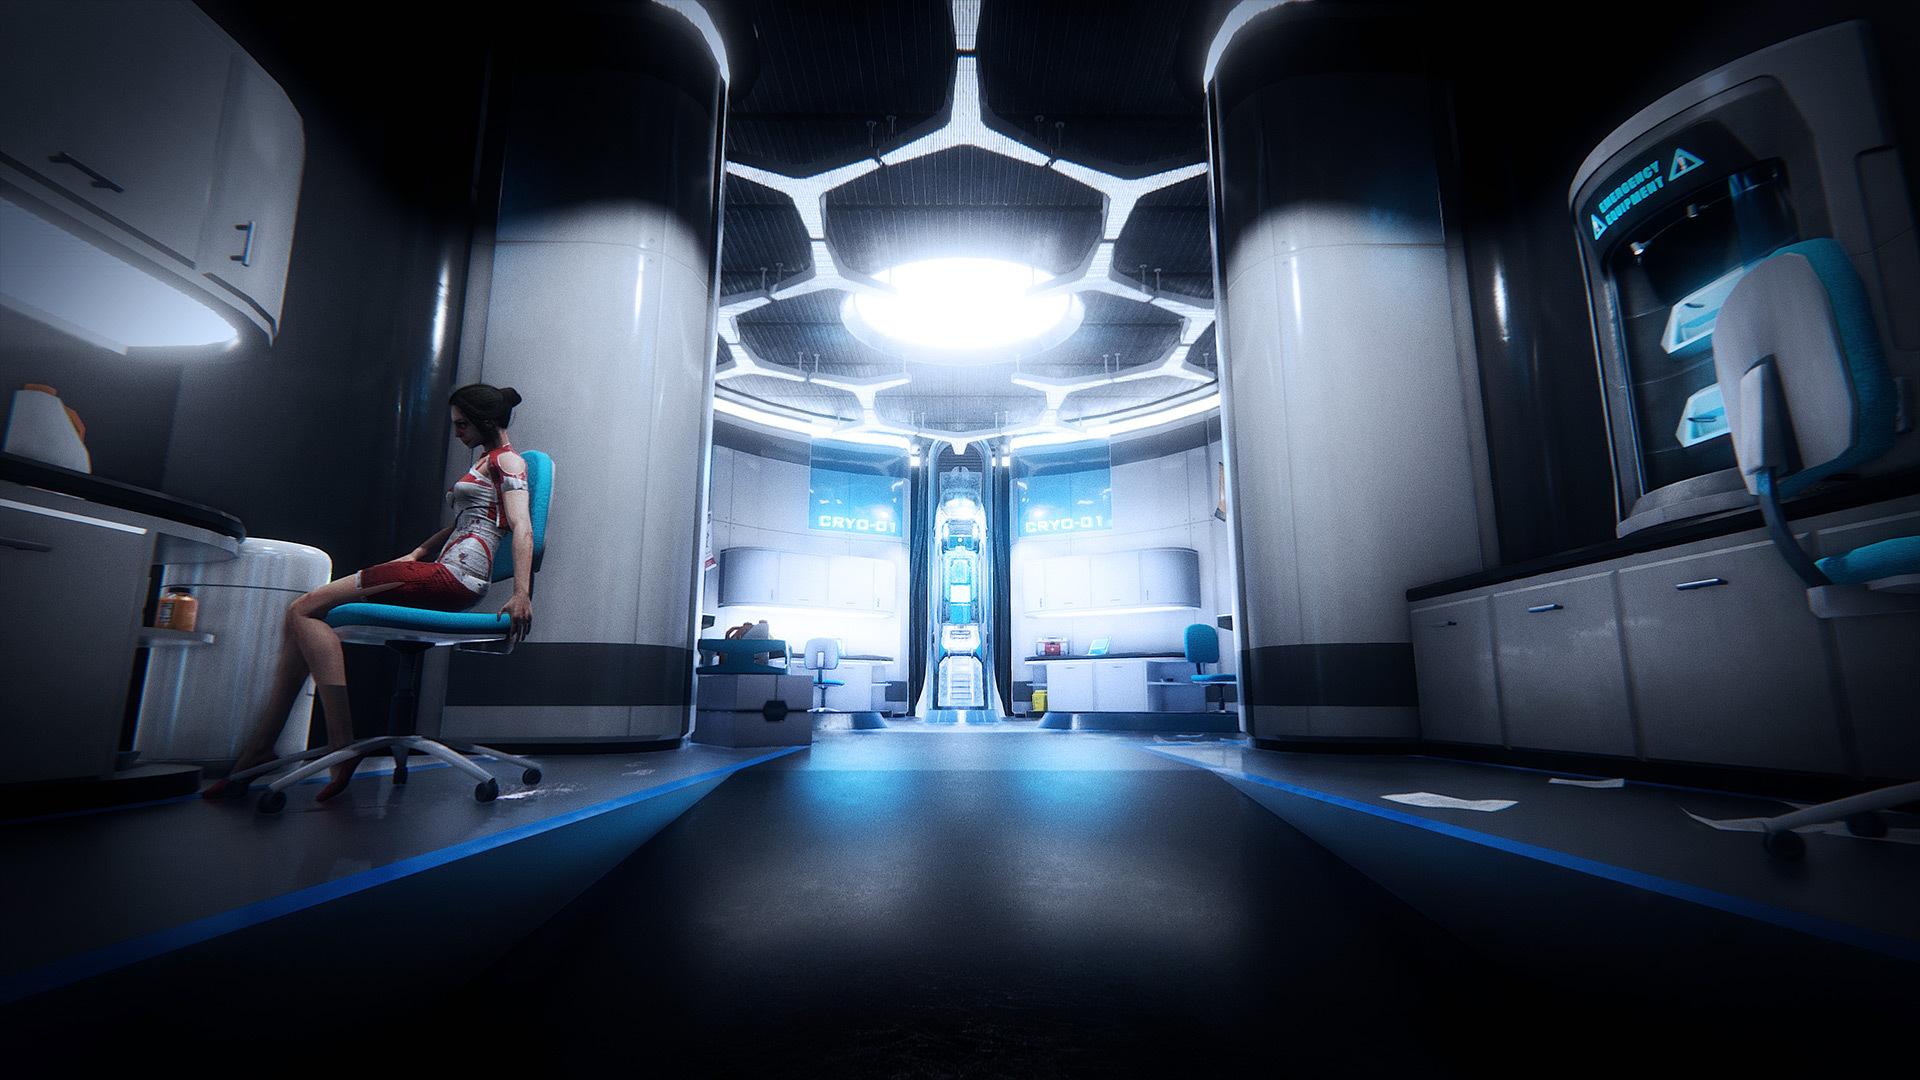 Oct 7, 2016 New game ideas! Subterrain - Pixellore Hi